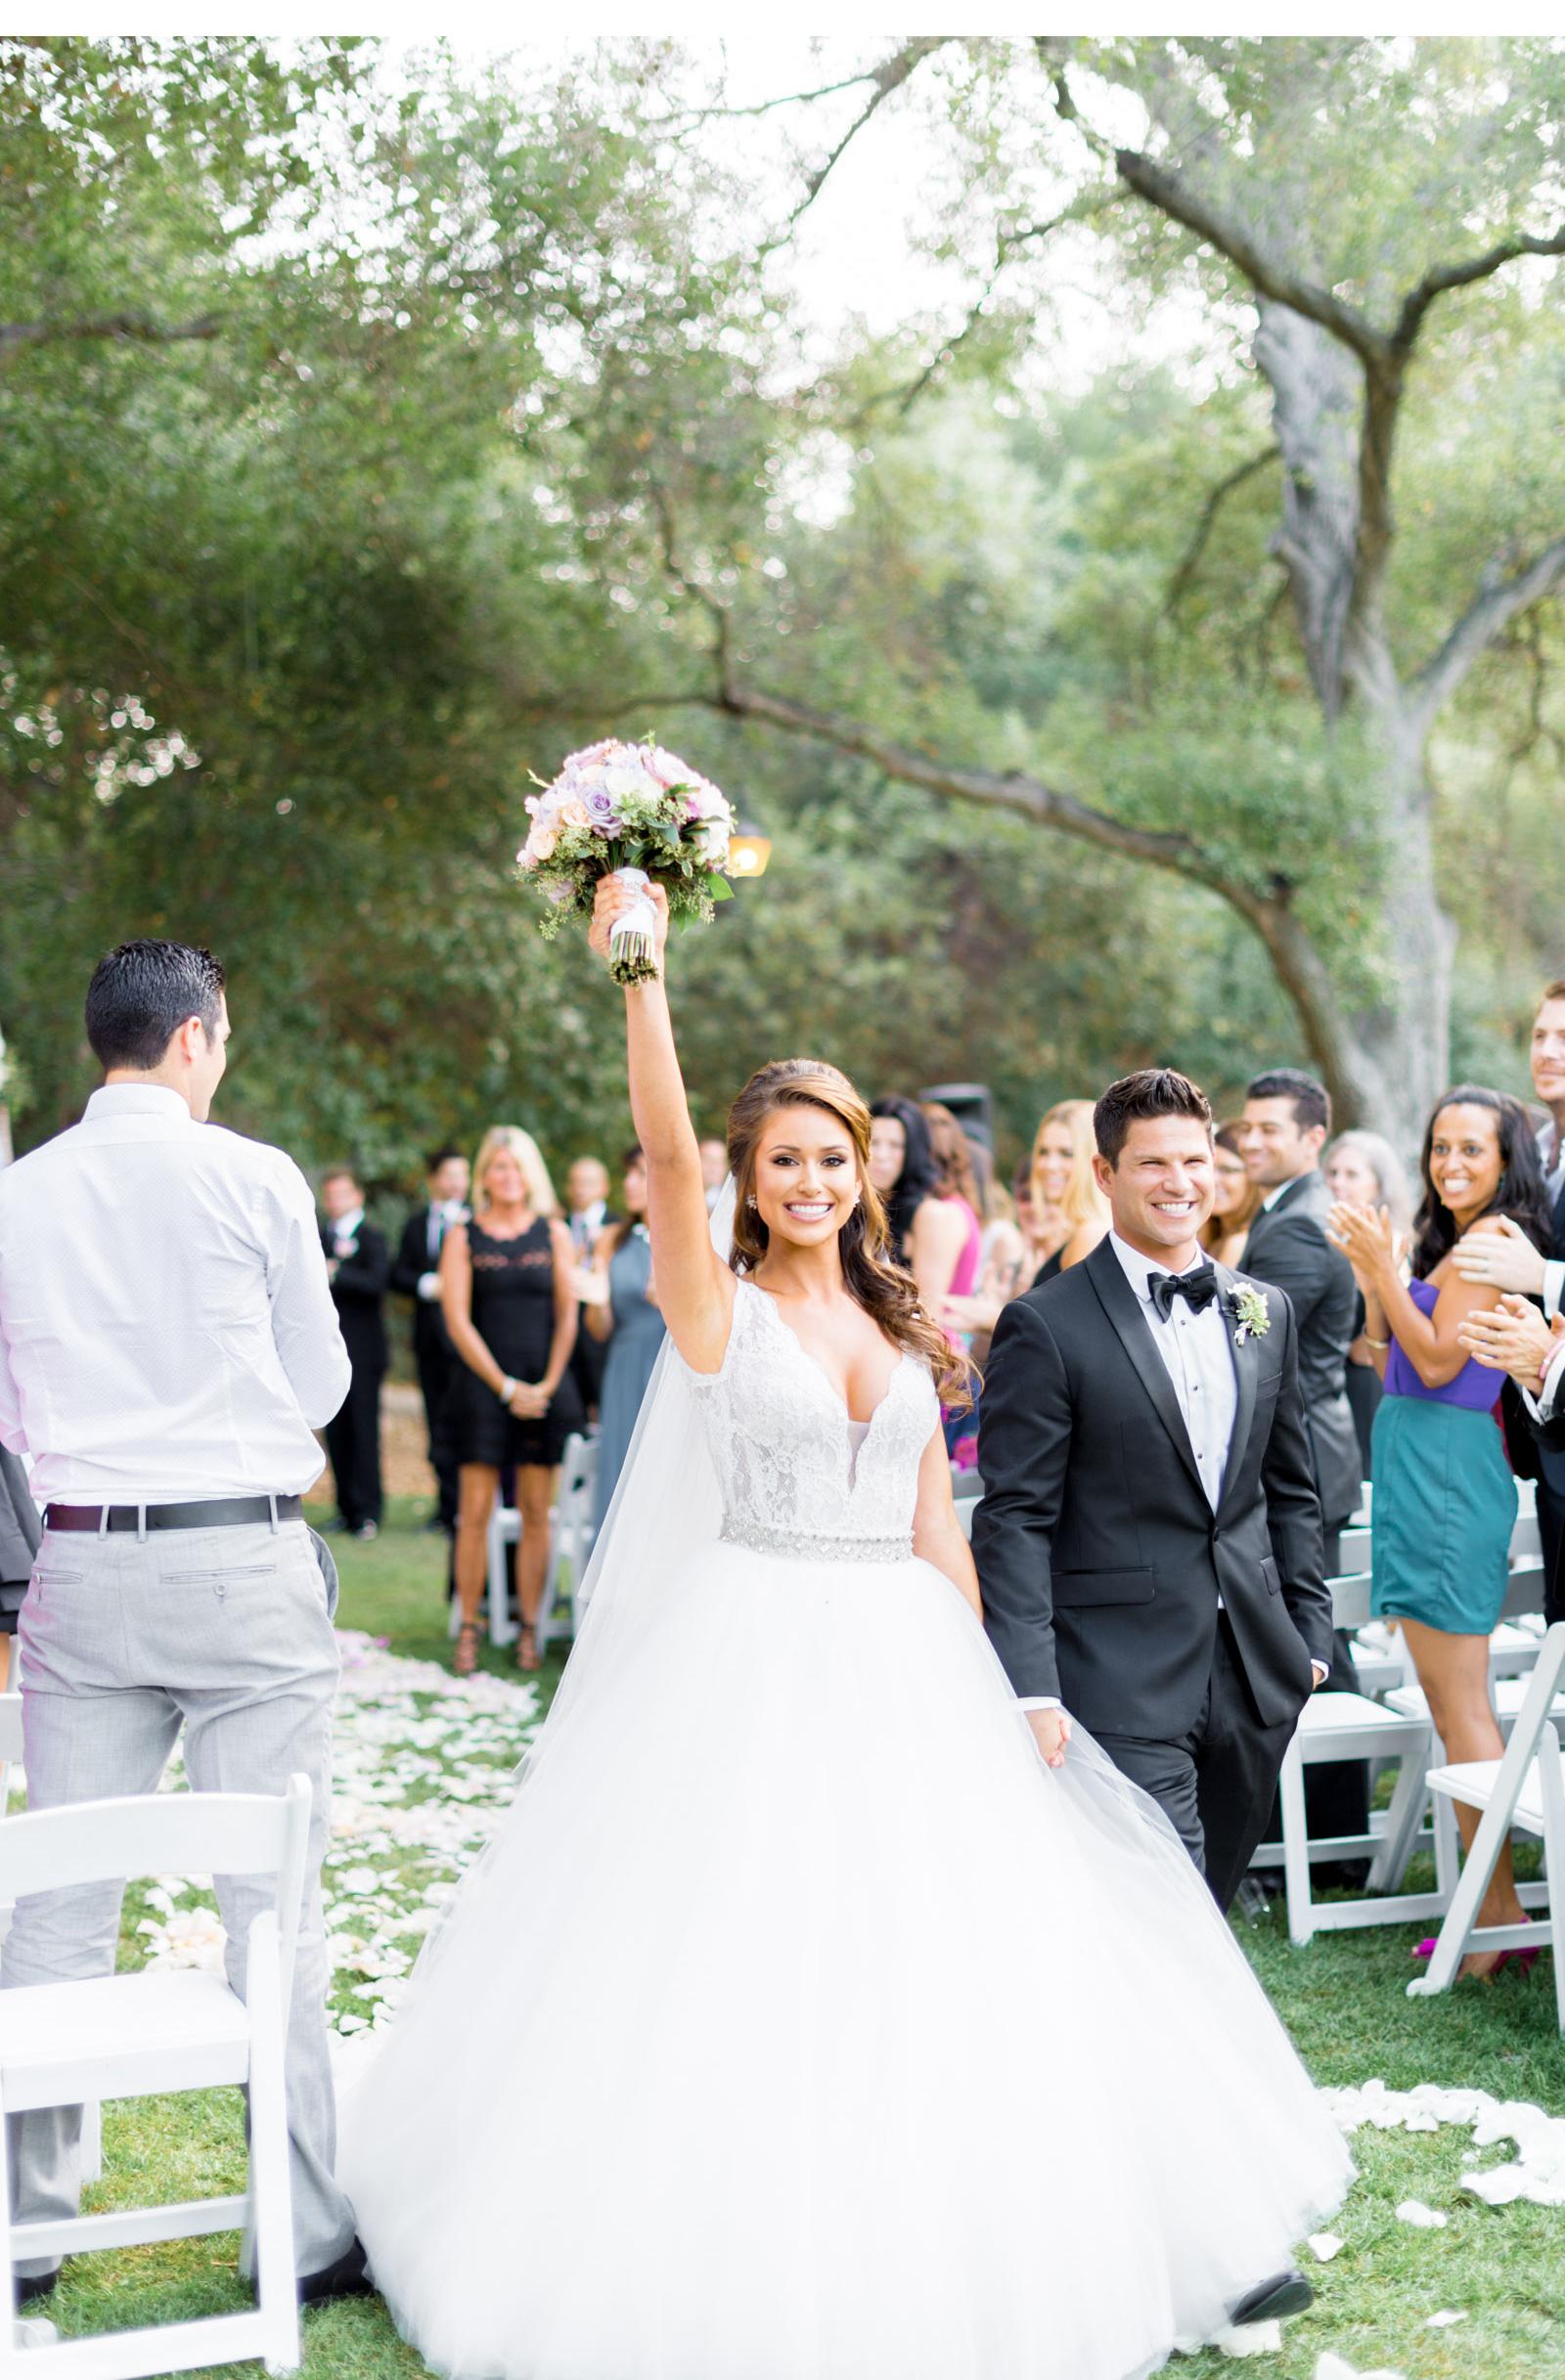 Miss-USA-Wedding-Ceremony-Natalie-Schutt-Photography_04.jpg